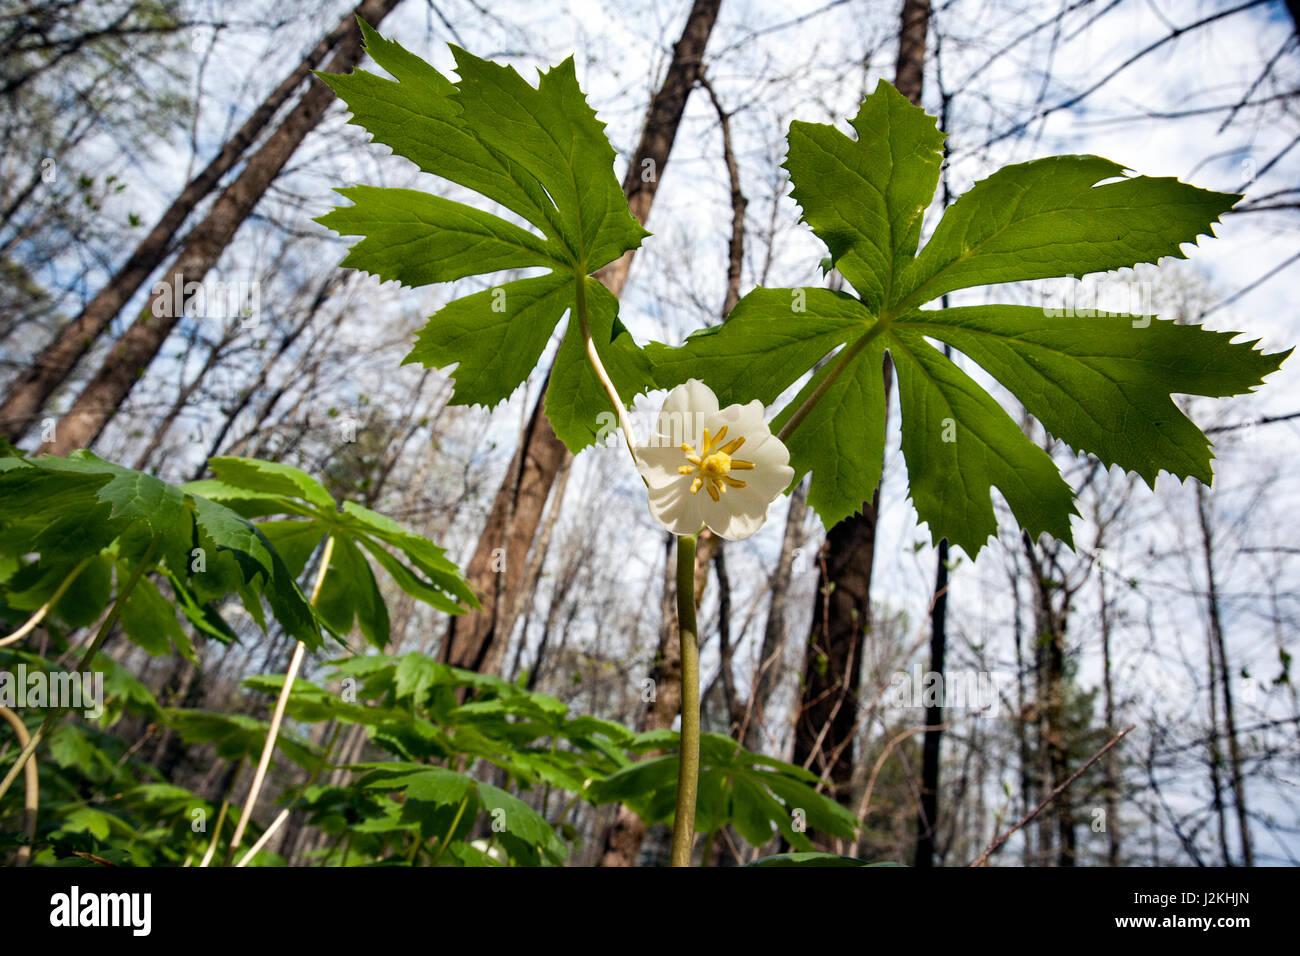 Mayapple (Podophyllum peltatum) - Holmes Educational State Forest, Hendersonville, North Carolina, USA - Stock Image